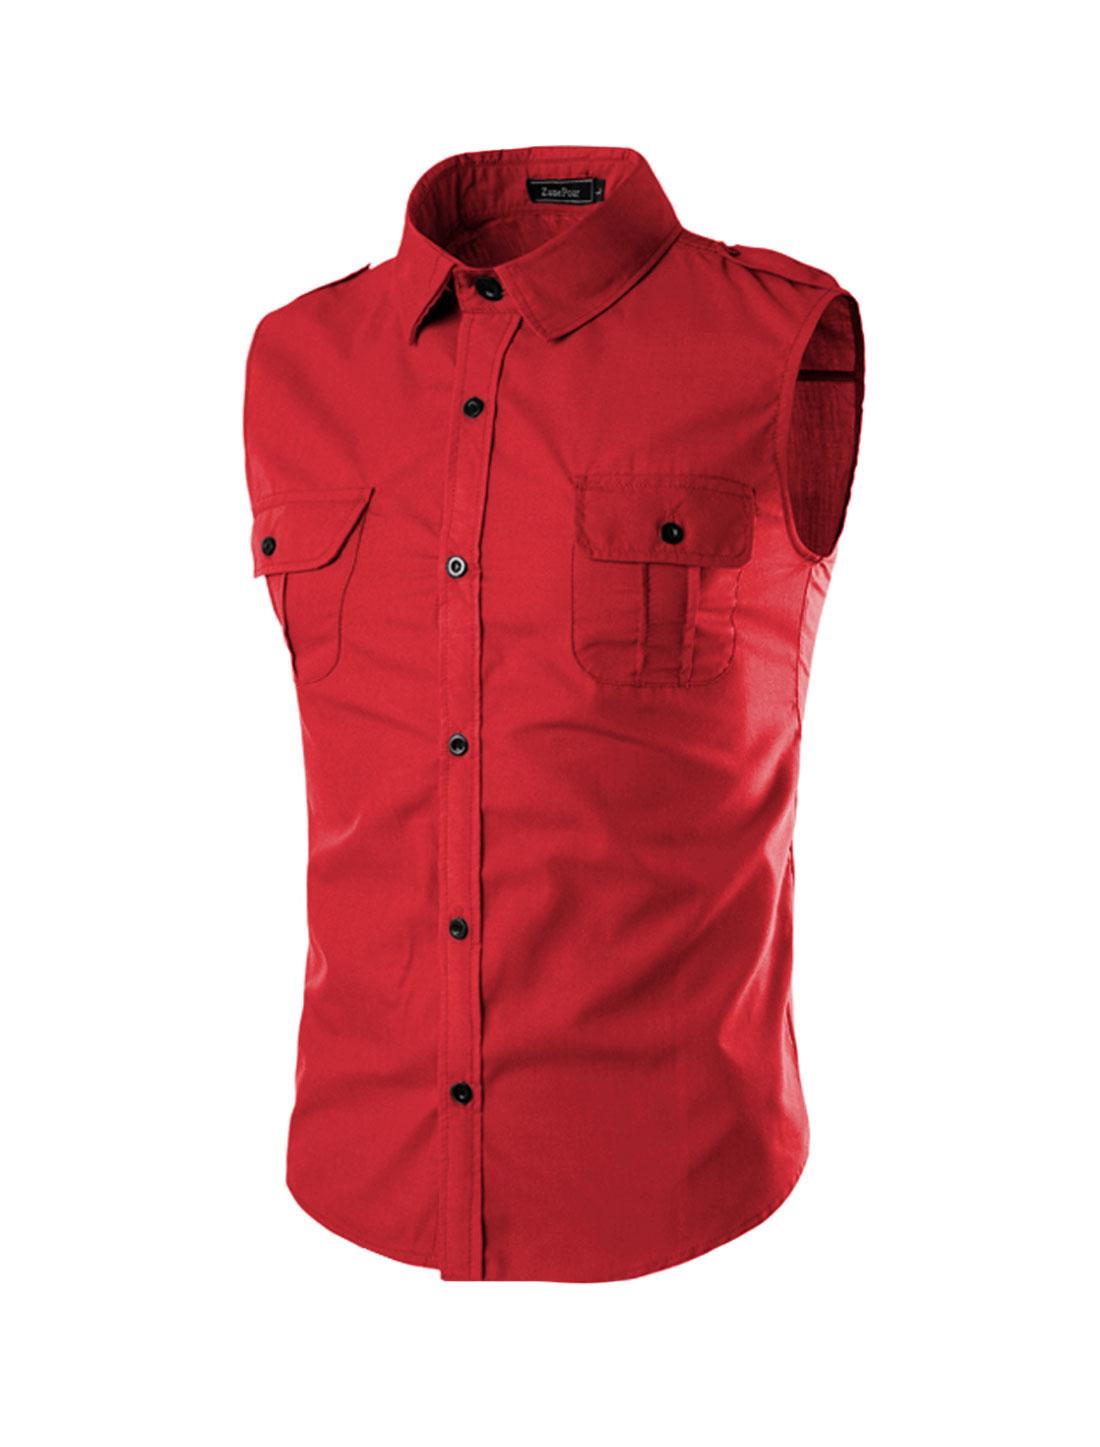 Men Flap Chest Pocket Button Closure Sleeveless Shirt Red M